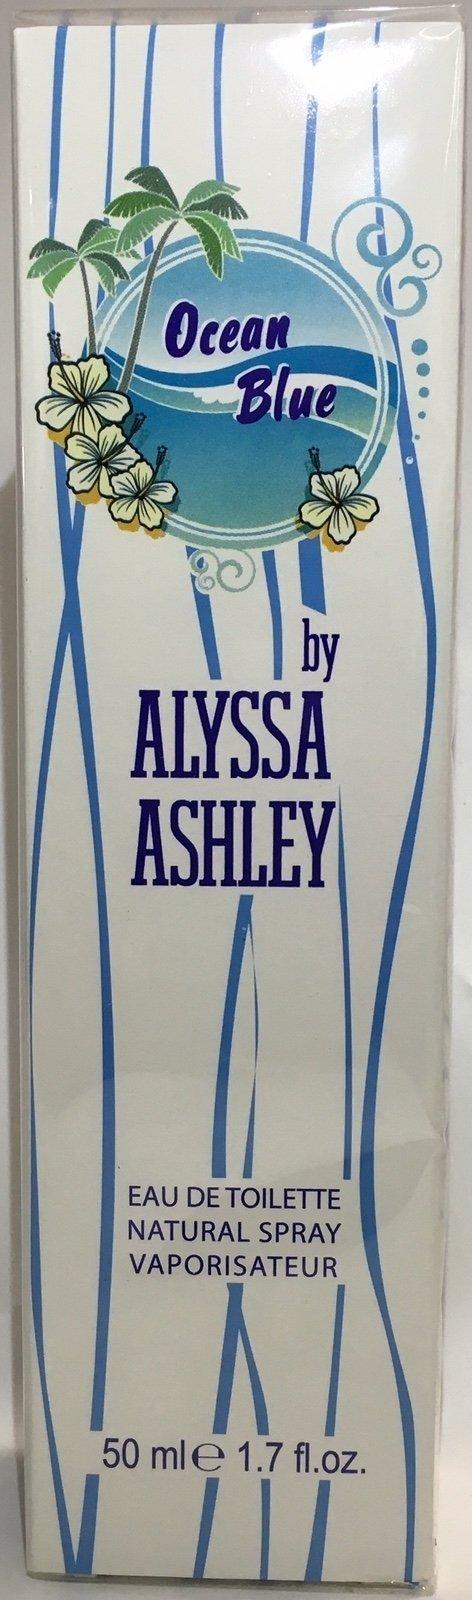 ALYSSA ASHLEY  - OCEAN BLUE Eau De Toilette SPRAY      50 ML - 3495080793053